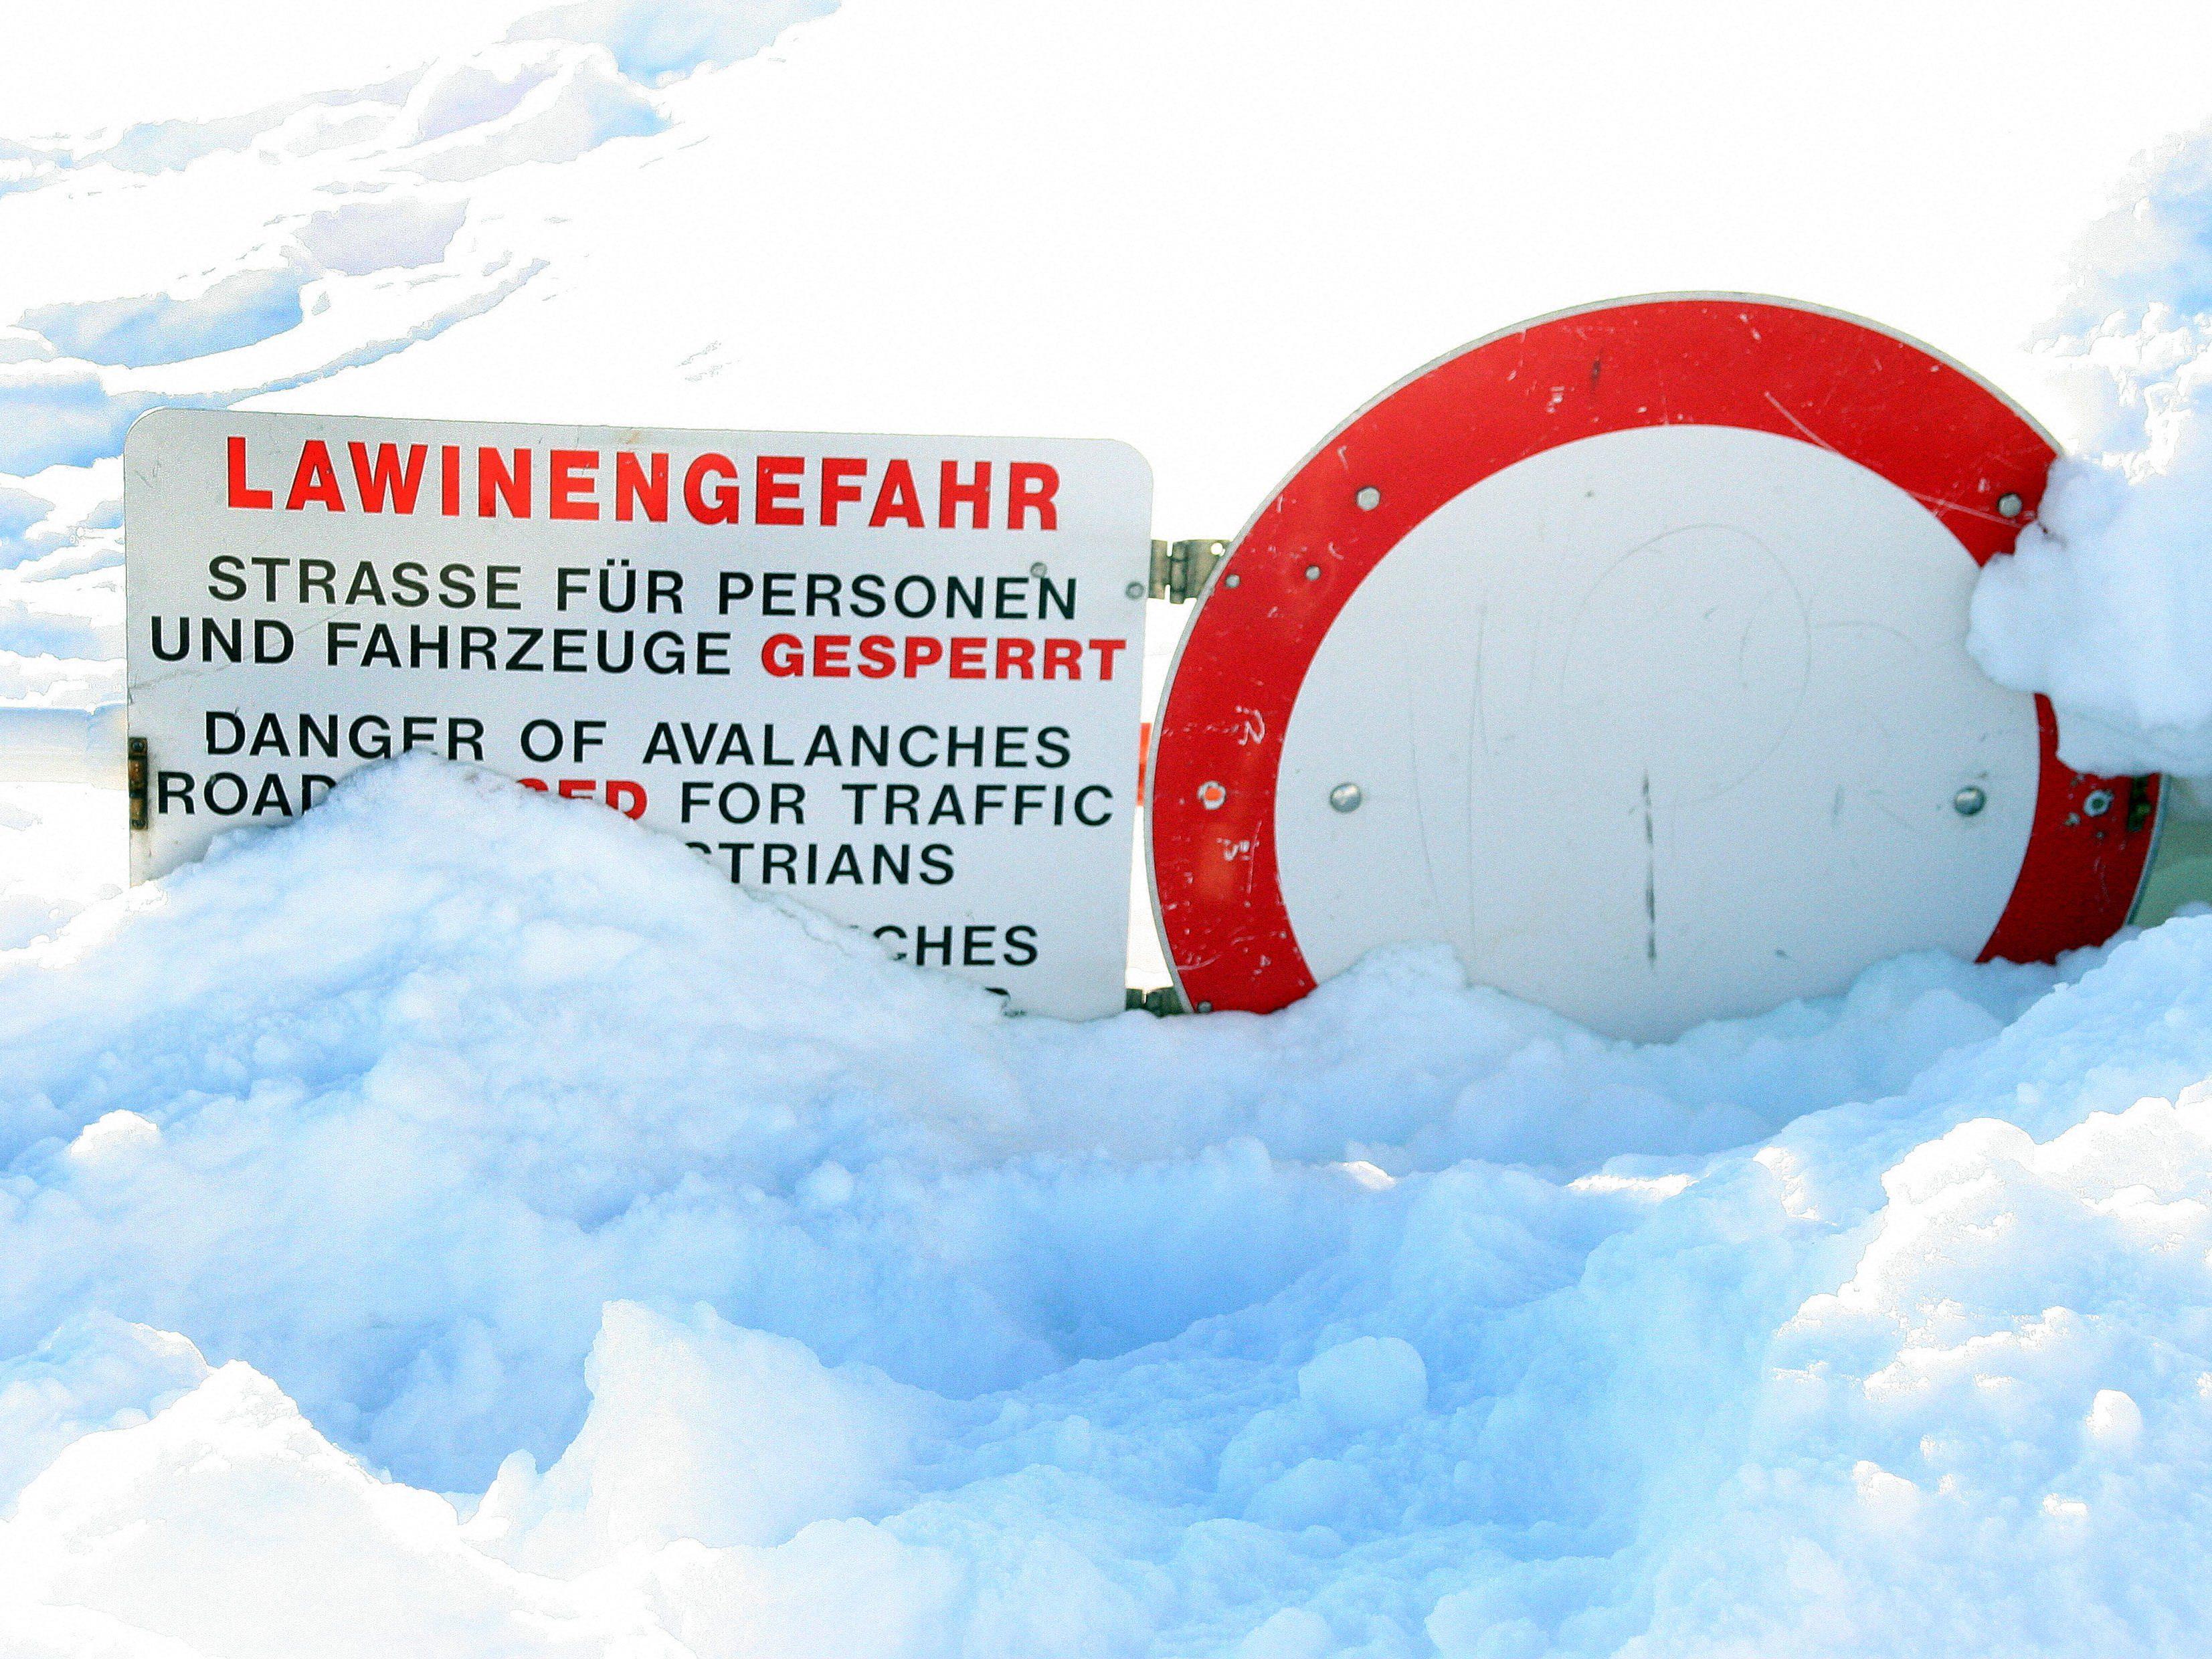 Lawinenabgang: In Vorarlberg herrscht erhebliche Lawinengefahr.